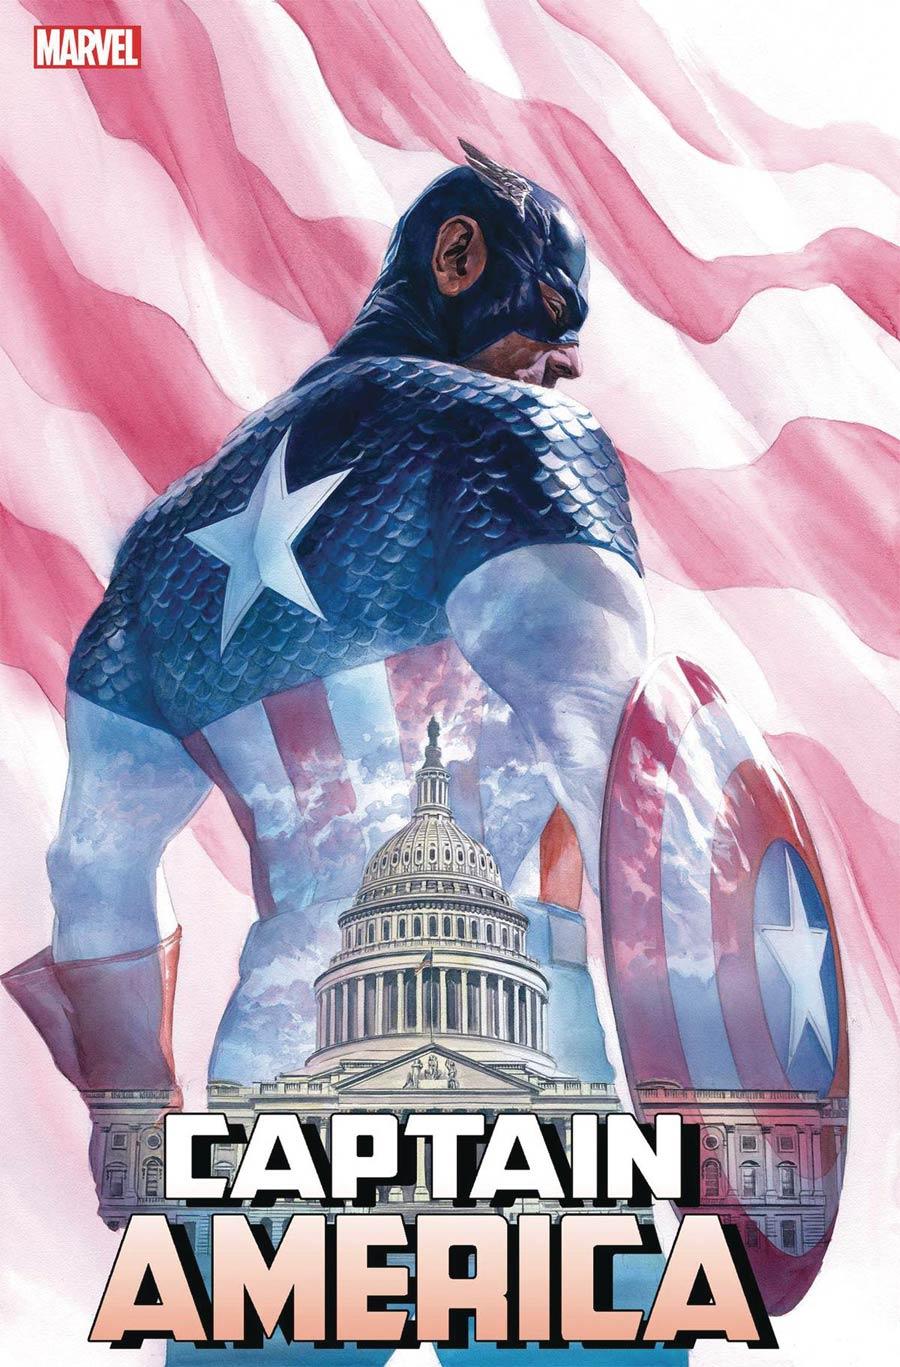 MARVEL COMICS//2019 CAPTAIN AMERICA #9 ALEX ROSS MAIN COVER